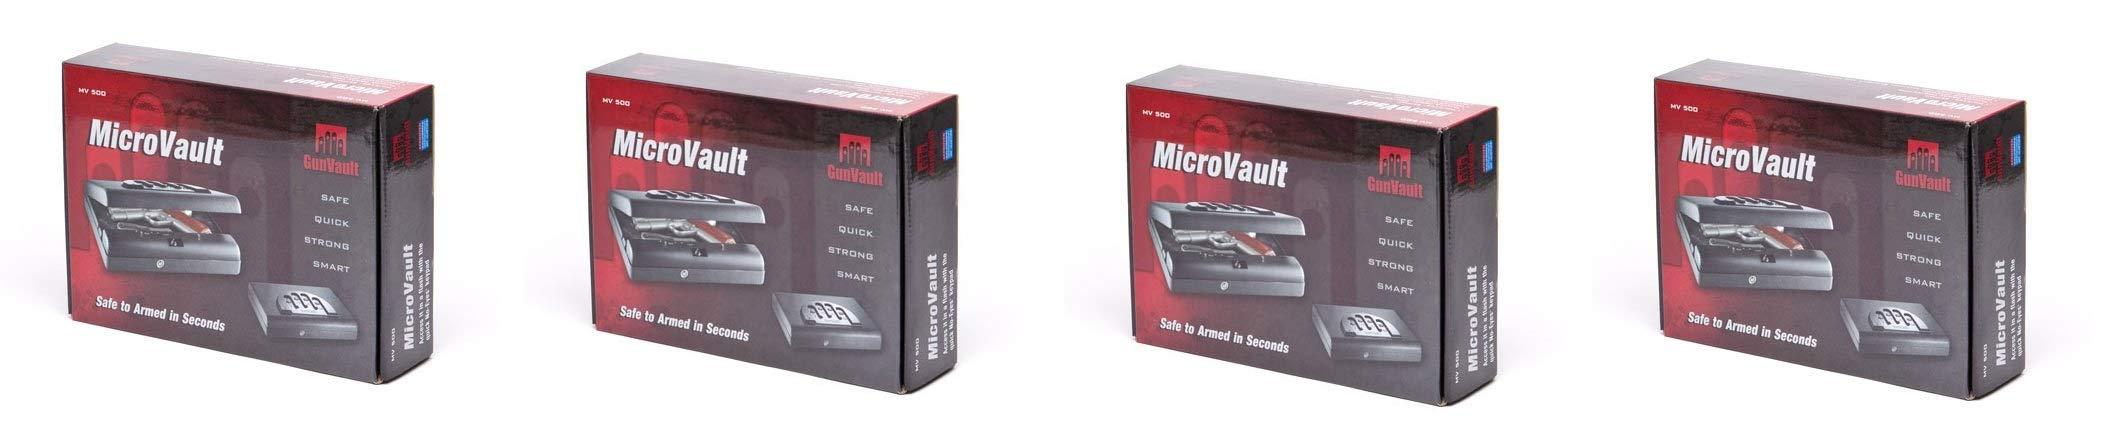 MV500 Microvault Pistol Gun Safe (Pack of 4)